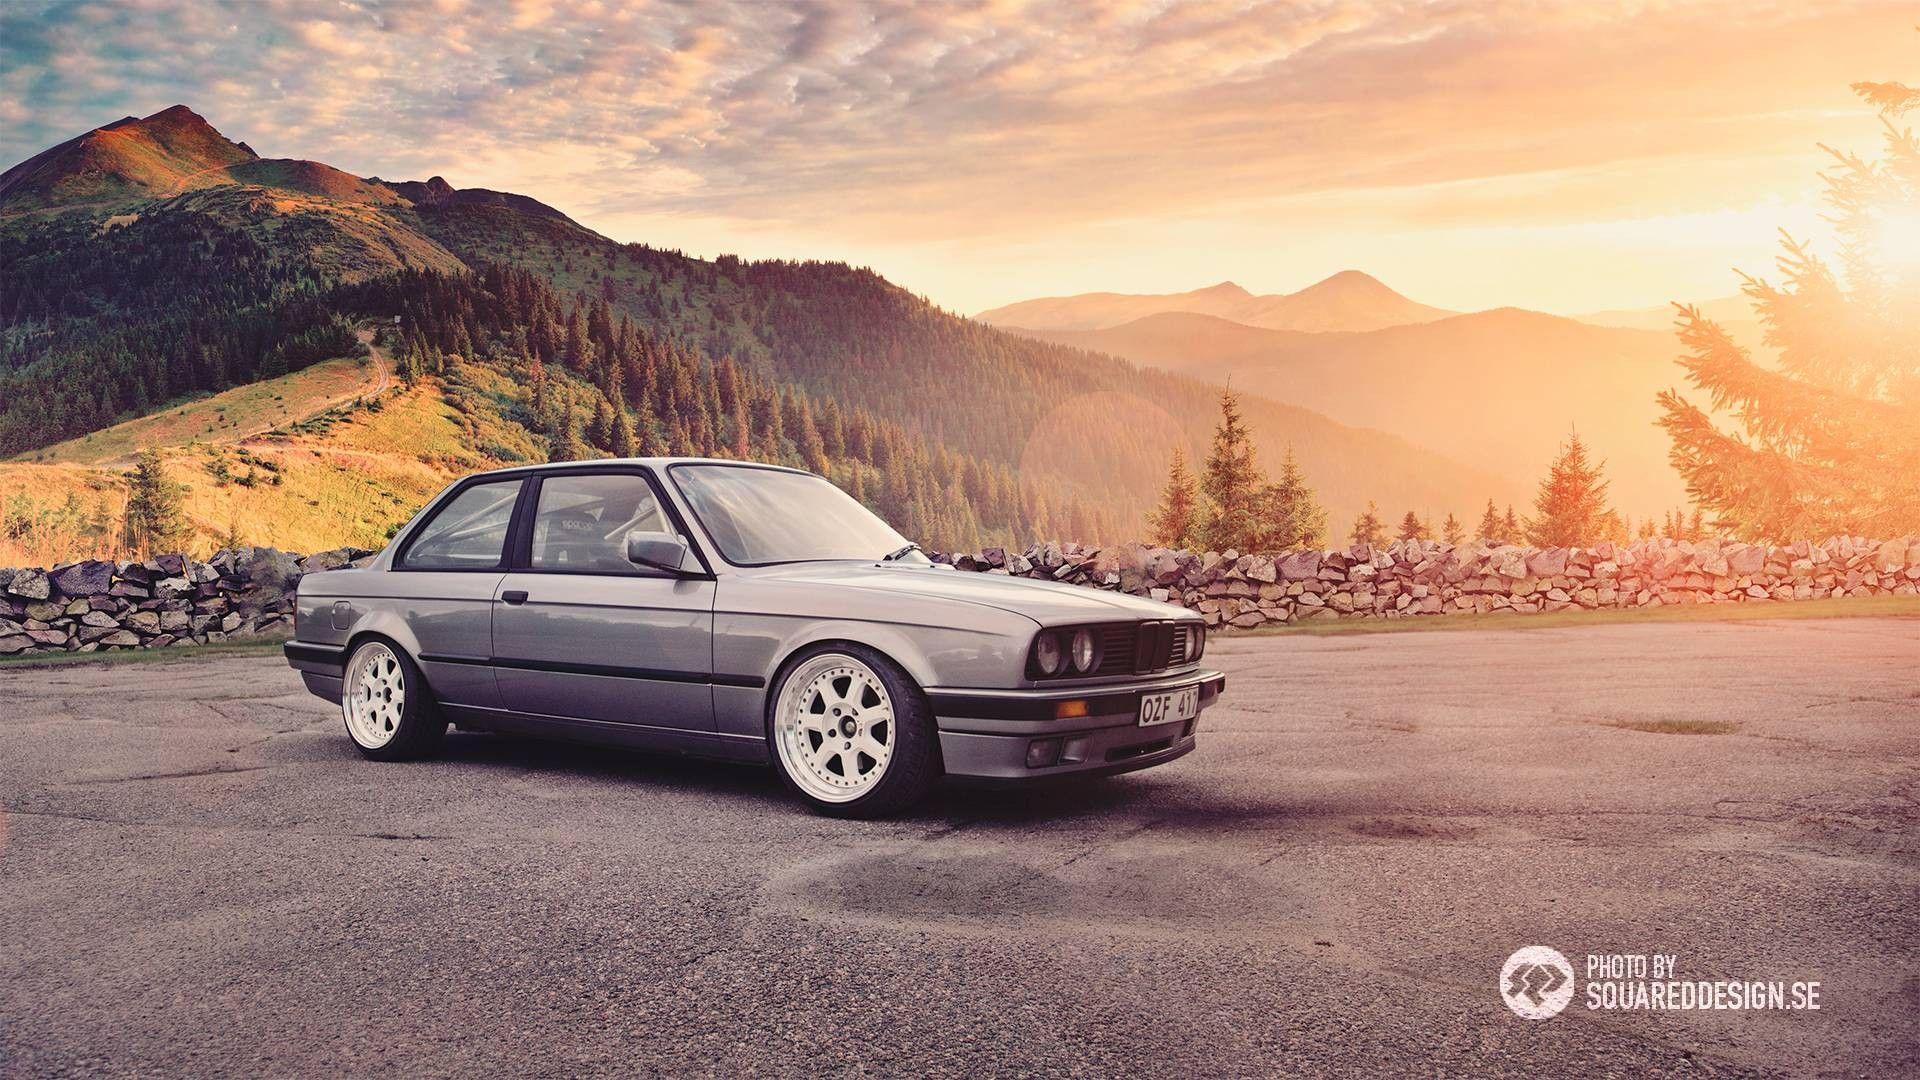 Bmw I30 >> BMW E30 Wallpapers - Wallpaper Cave